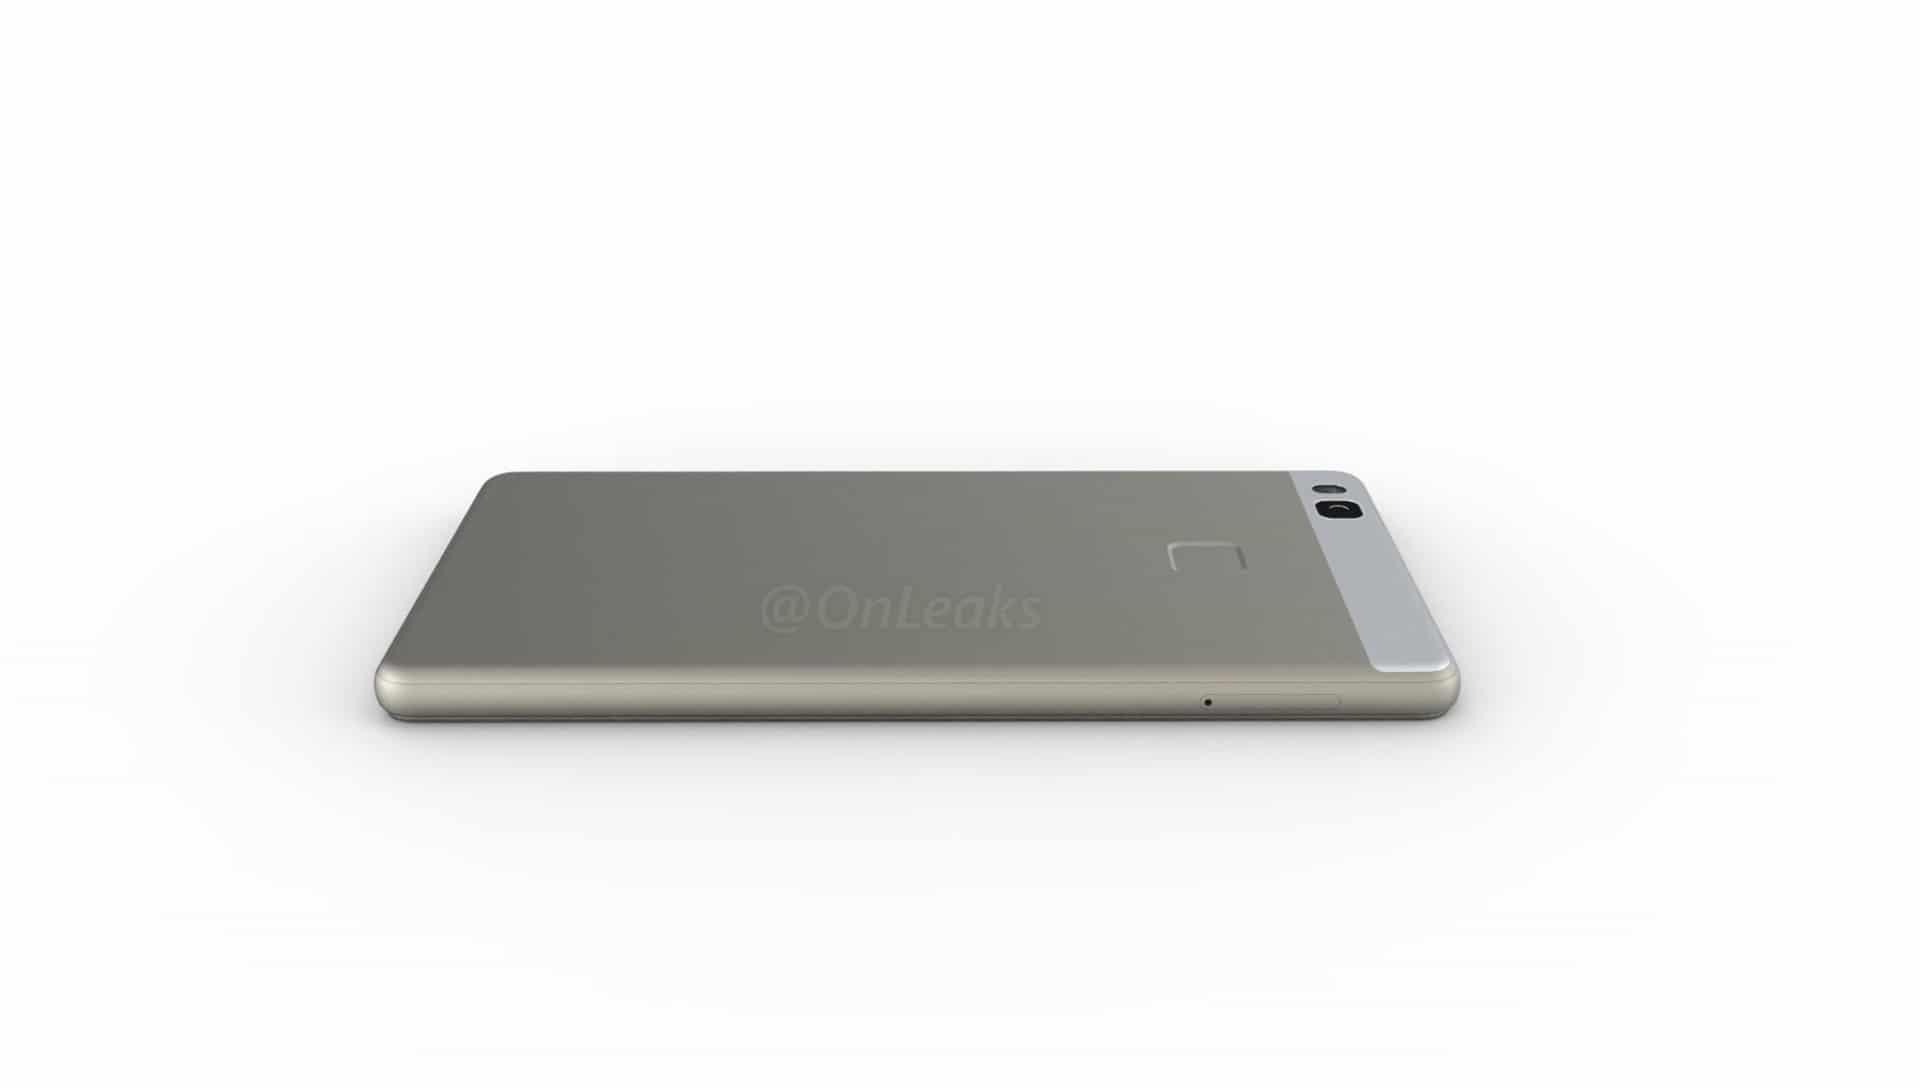 Huawei P9 Lite tranches